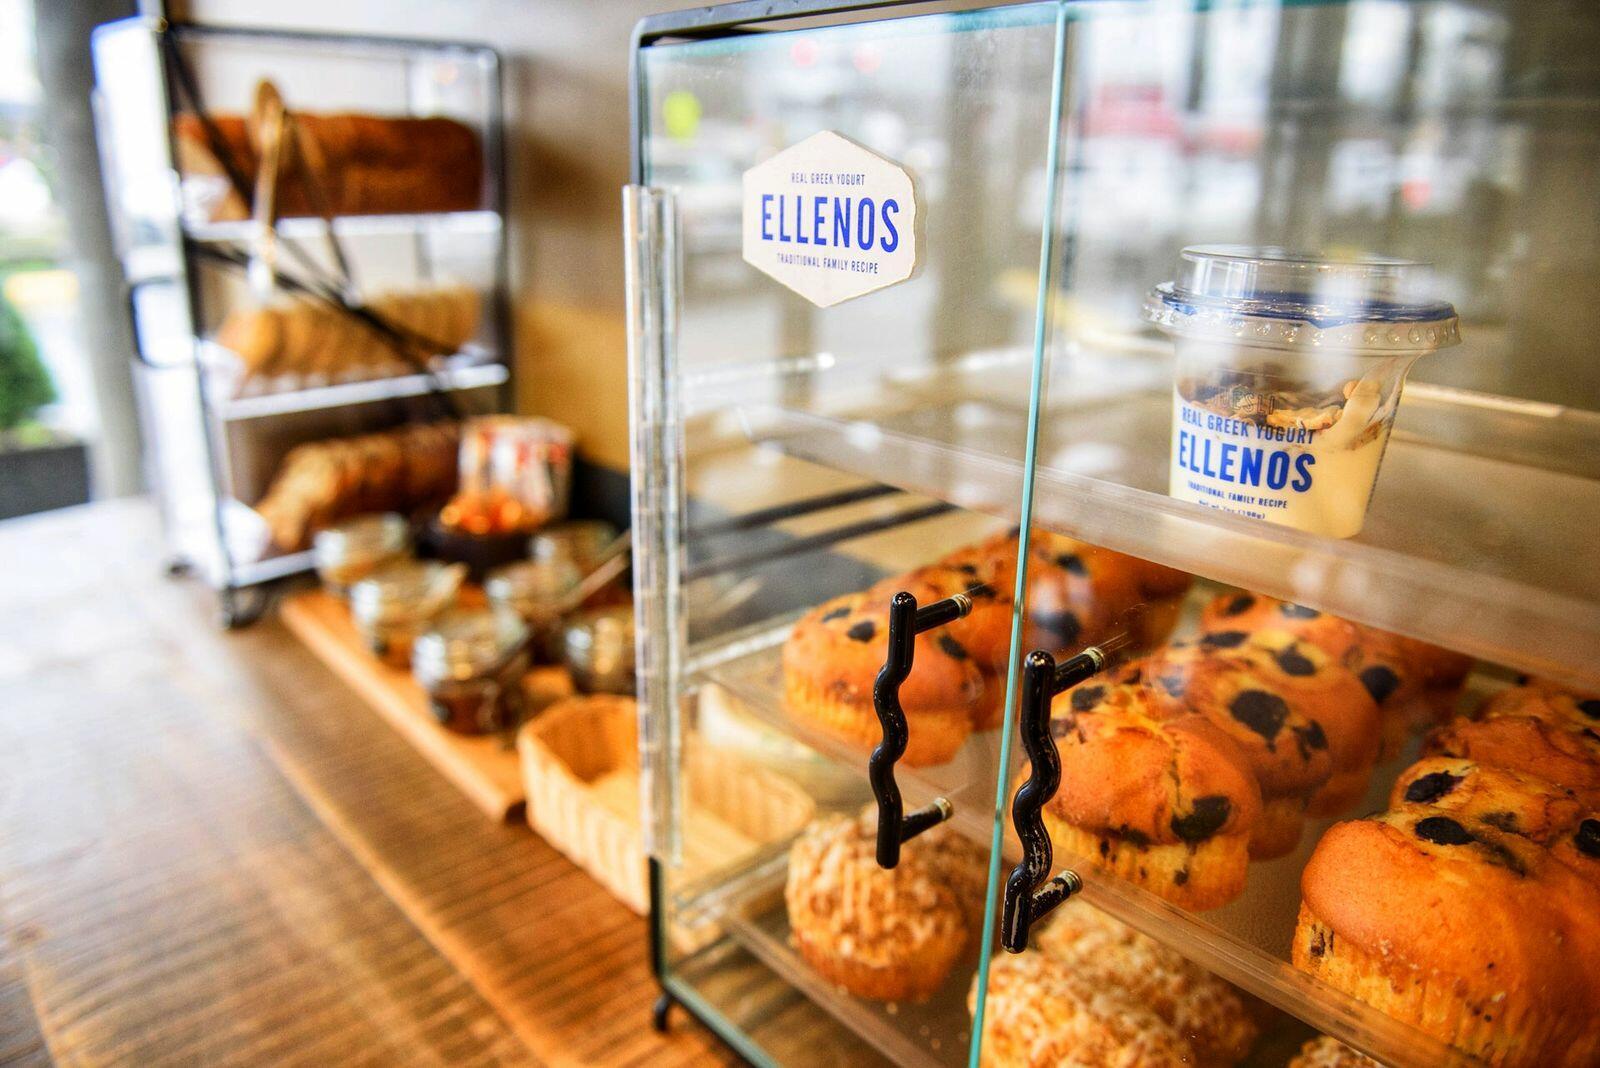 muffins and yogurt in bakery